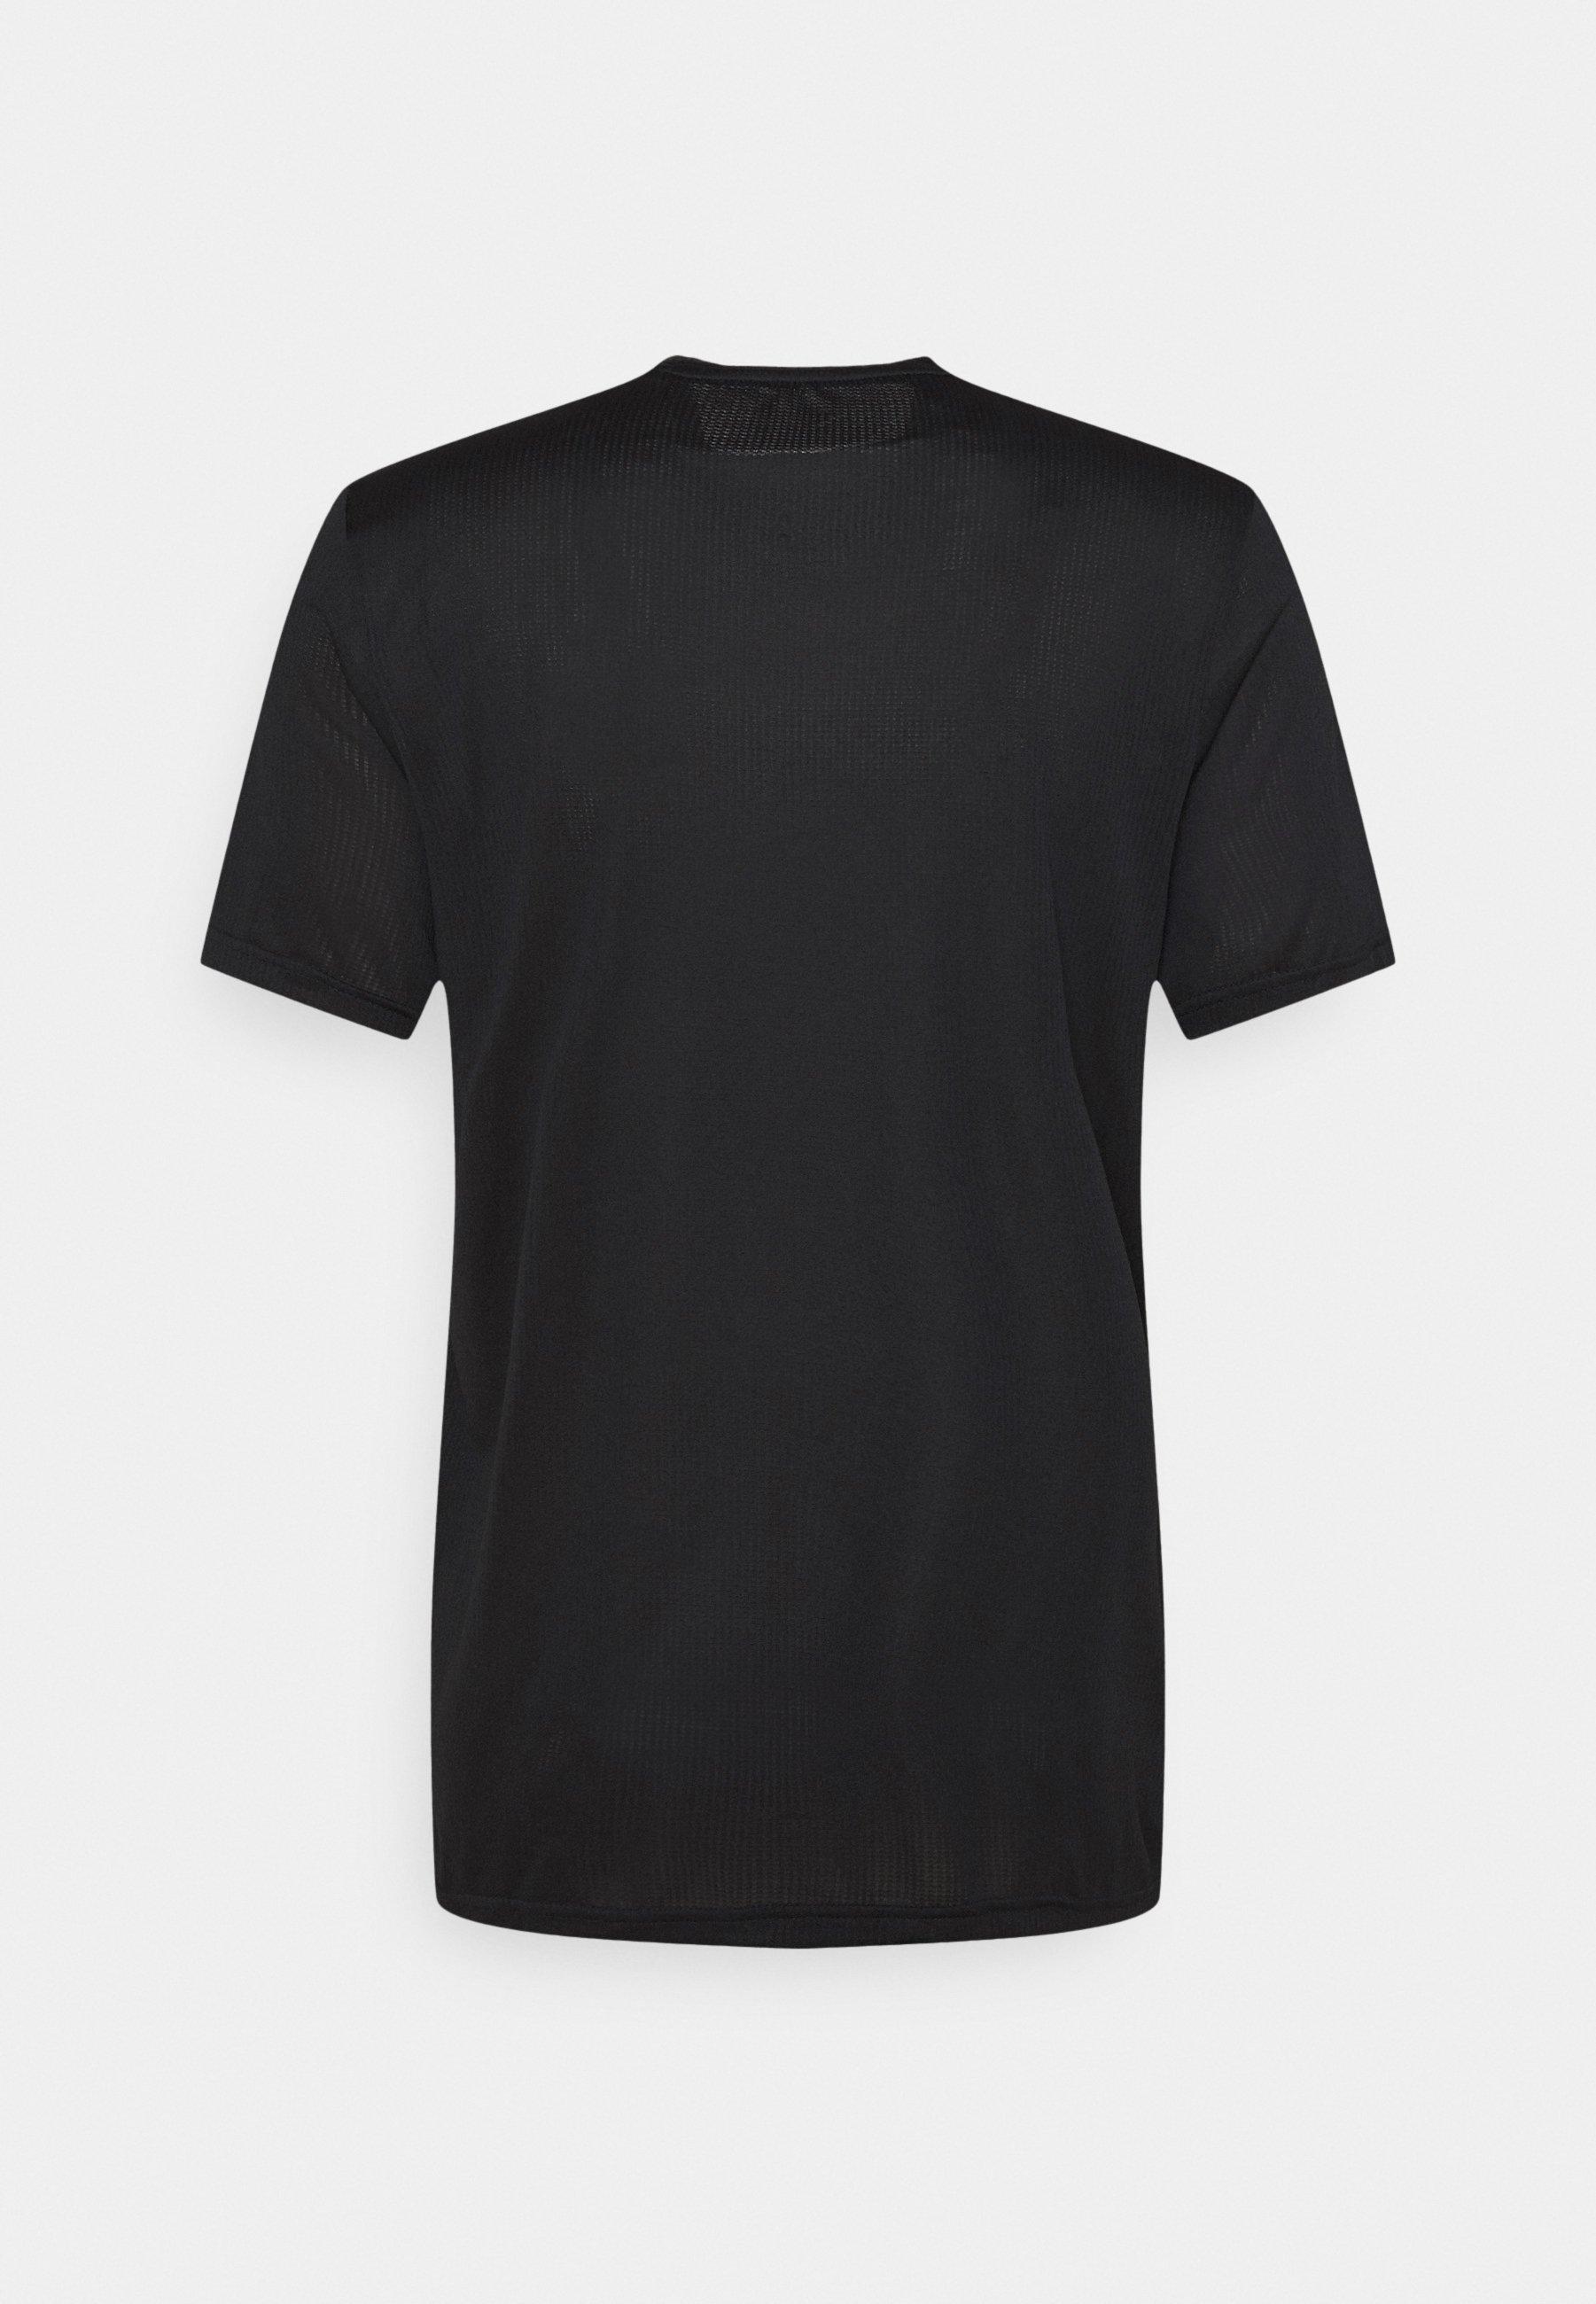 Homme TERREX PRIMEBLUE TRAIL FUNCTIONAL LOGO TEE - T-shirt imprimé